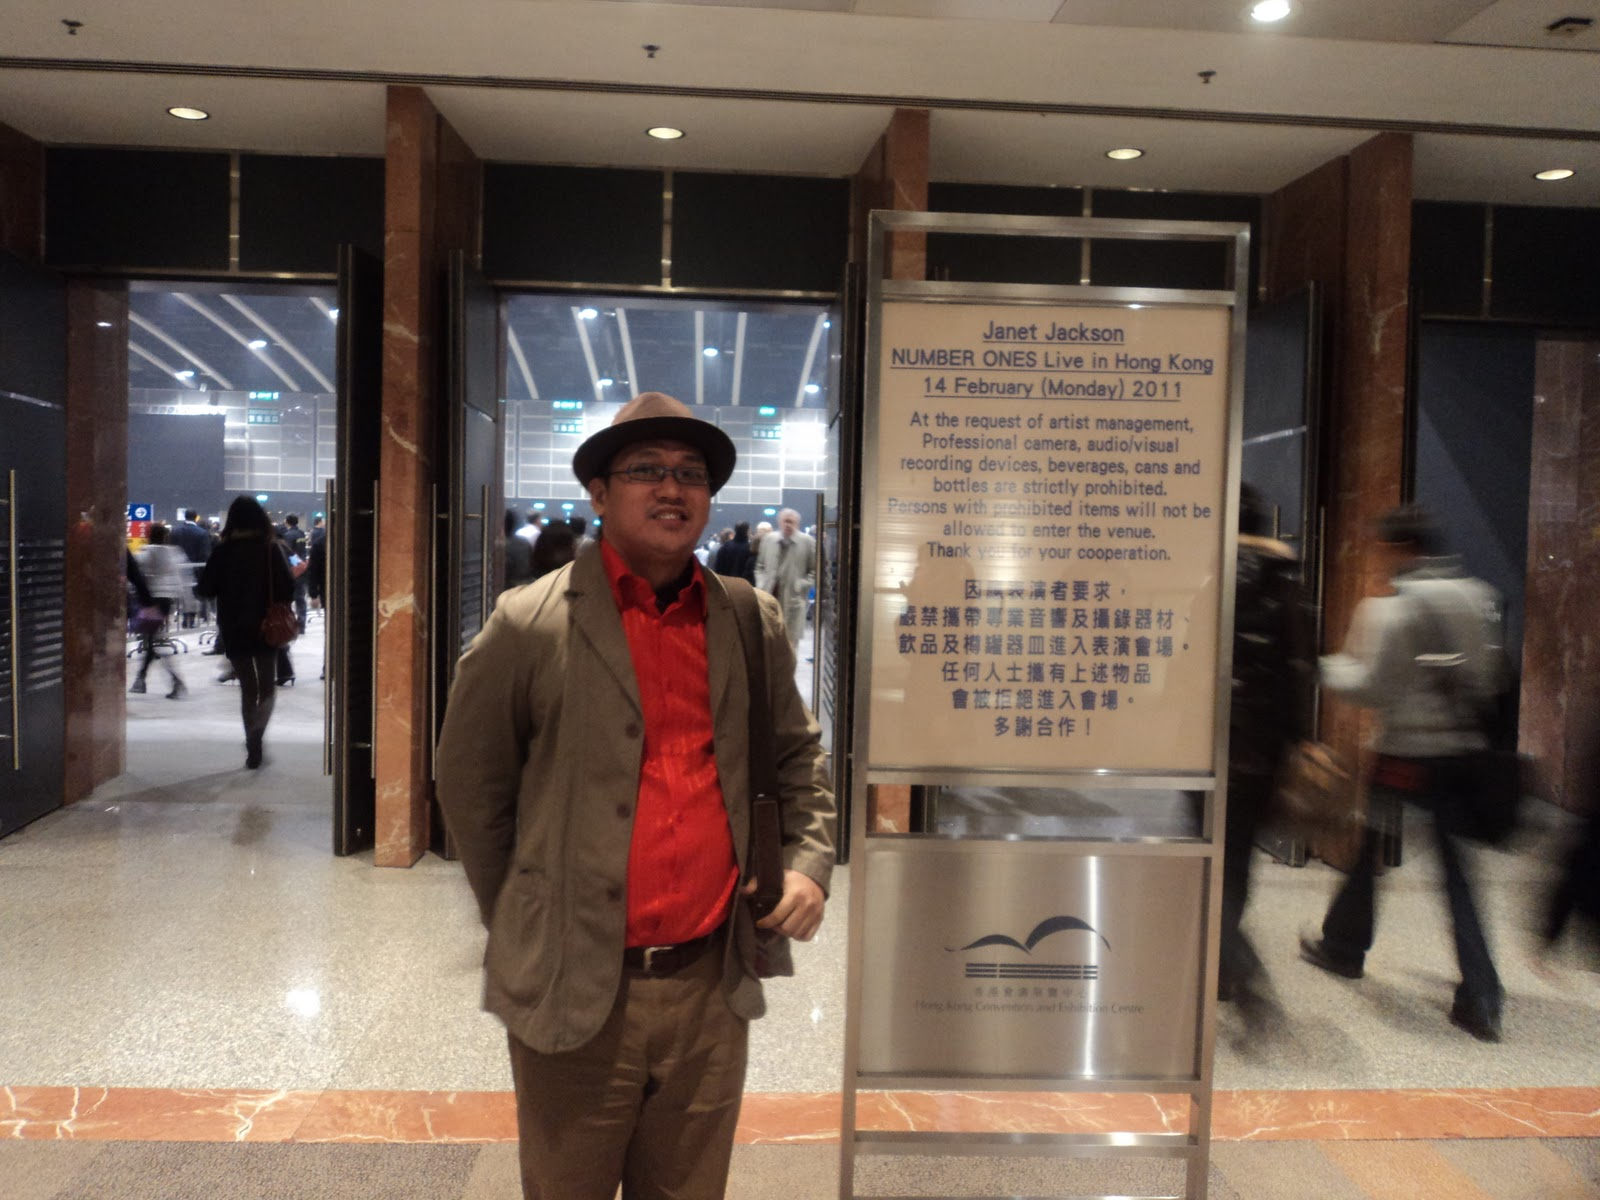 http://2.bp.blogspot.com/-M1nqFIh_yuI/TVzKgaZHq8I/AAAAAAAABjI/-wecRyxy-yM/s1600/More+HK+Pics+013.JPG